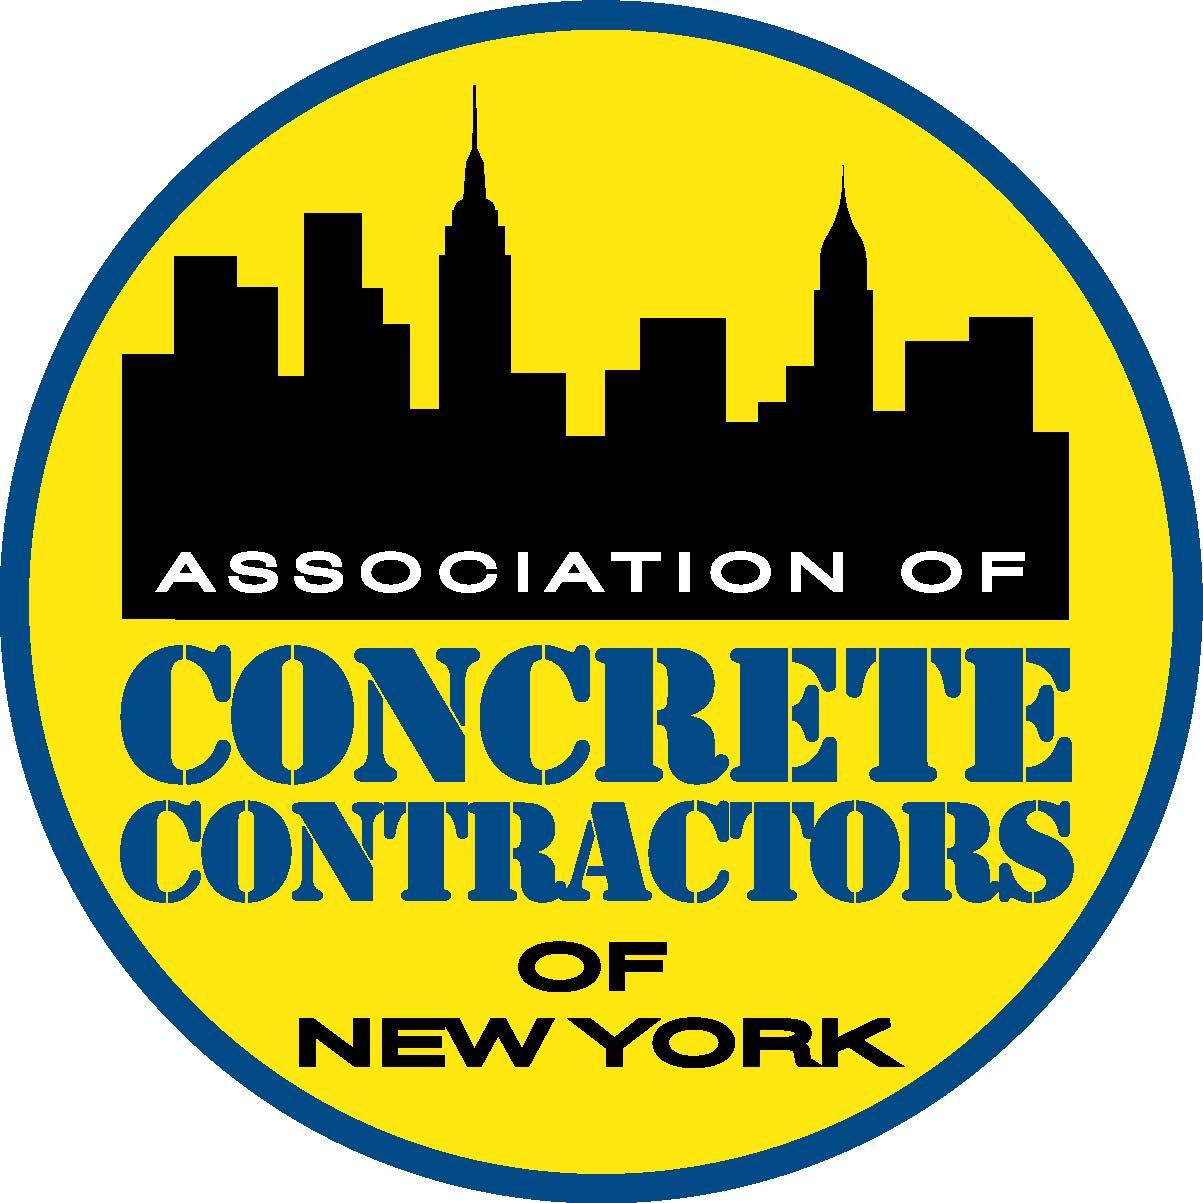 Association of Concrete Contractors of New York